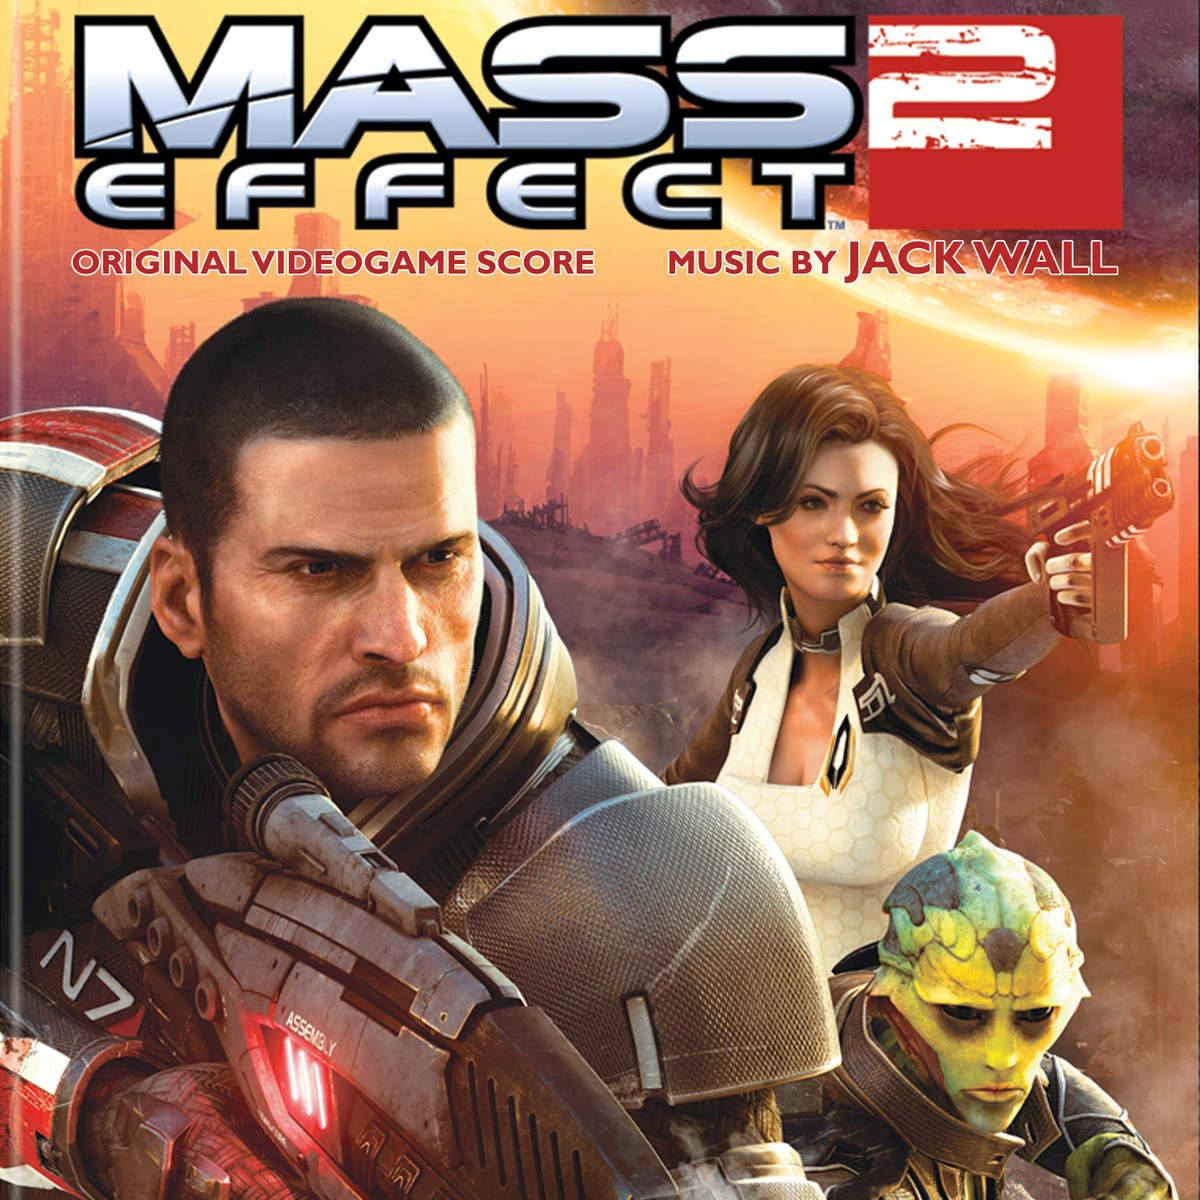 Mass_Effect_2_Original_Videogame_Score__cover1200x1200.jpg